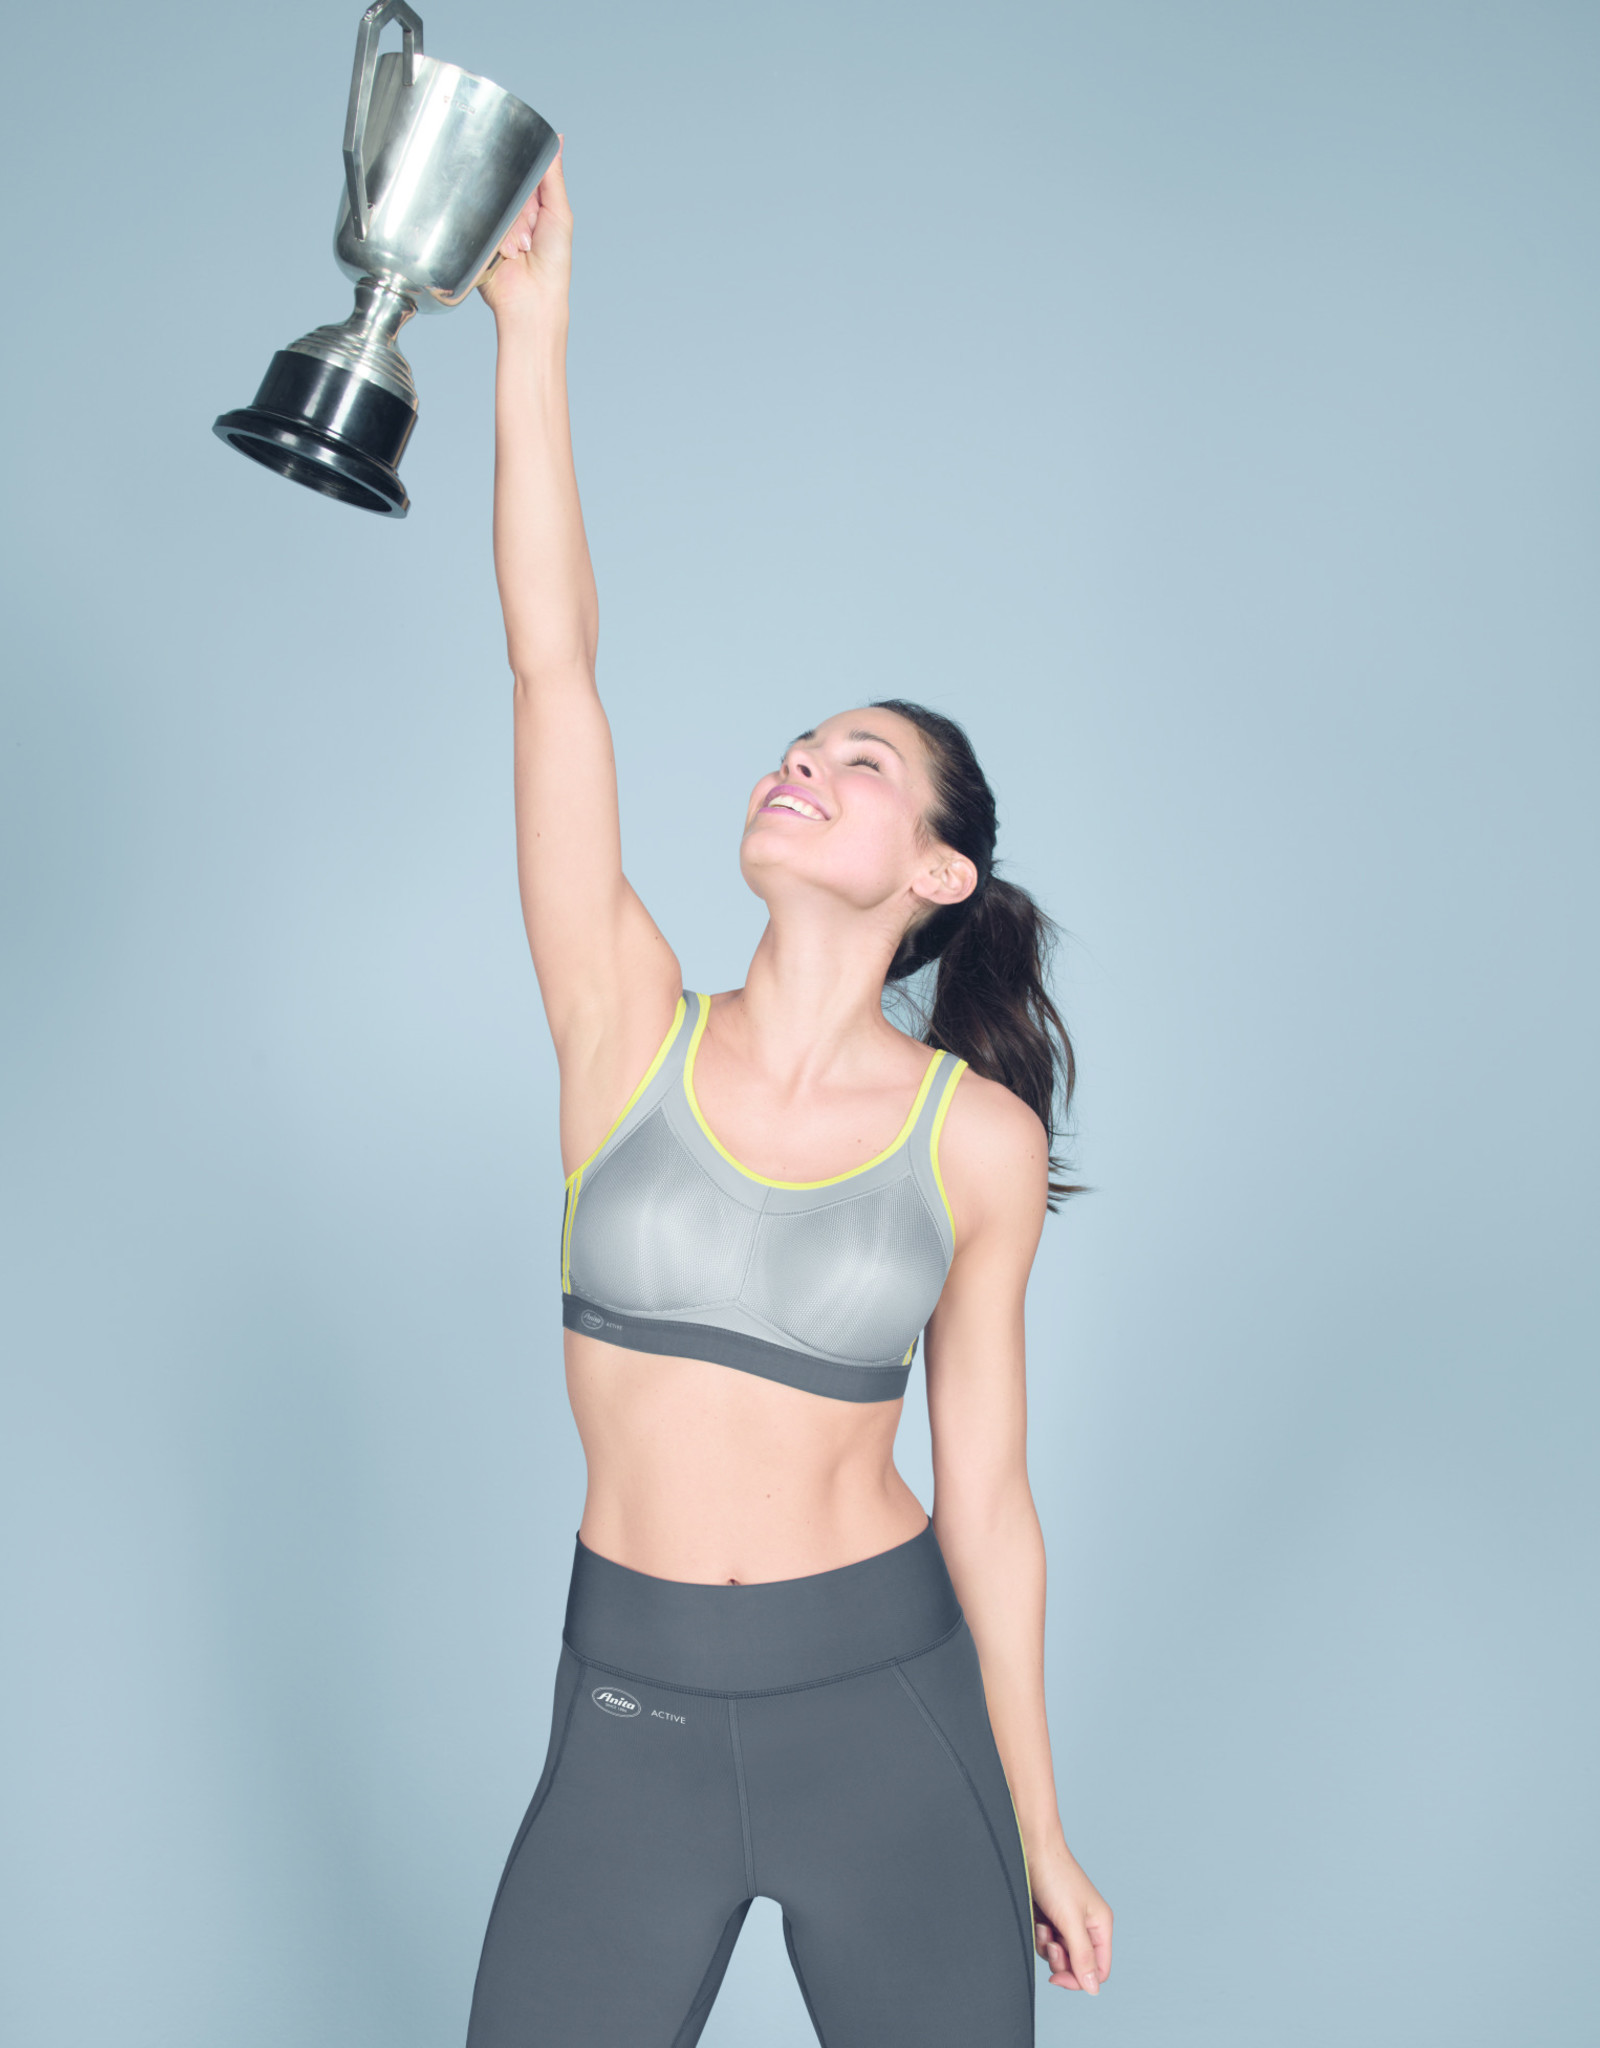 Anita Momentum Sports Bra 10 years of success in Iconic Grey